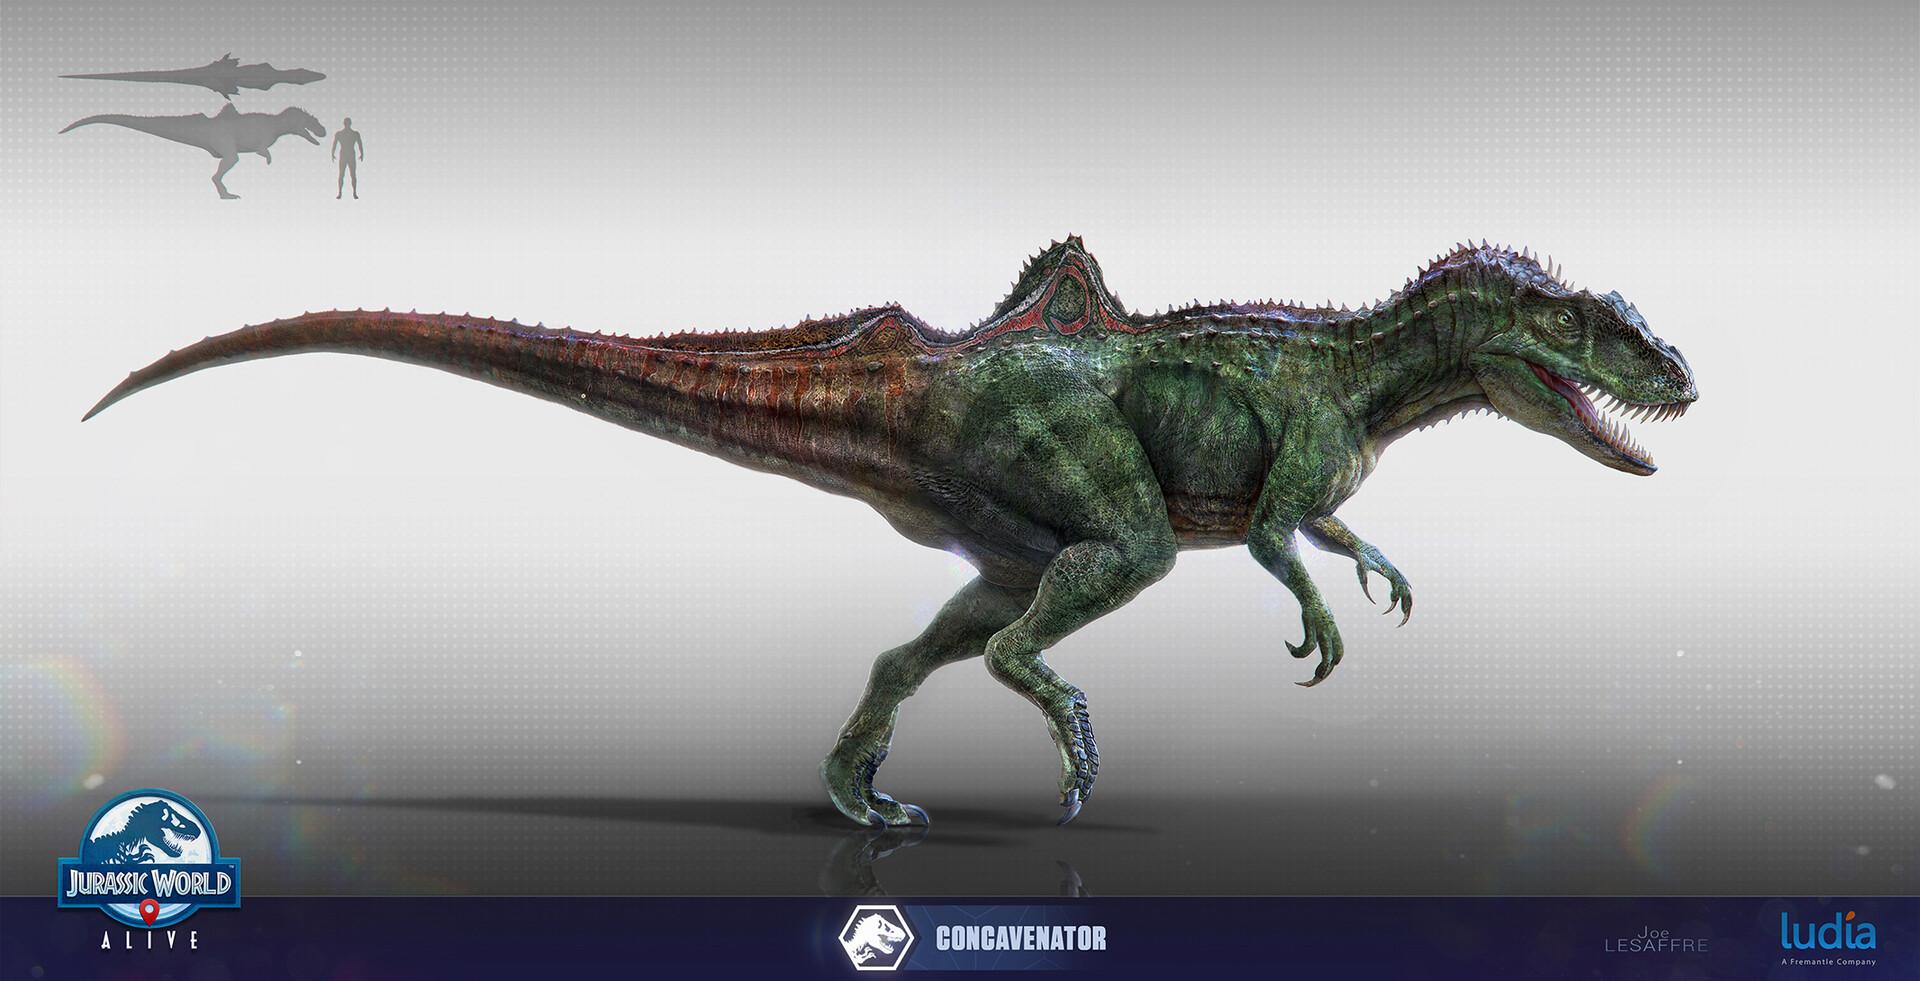 joe-lesaffre-concept-creature-concavenator.jpg